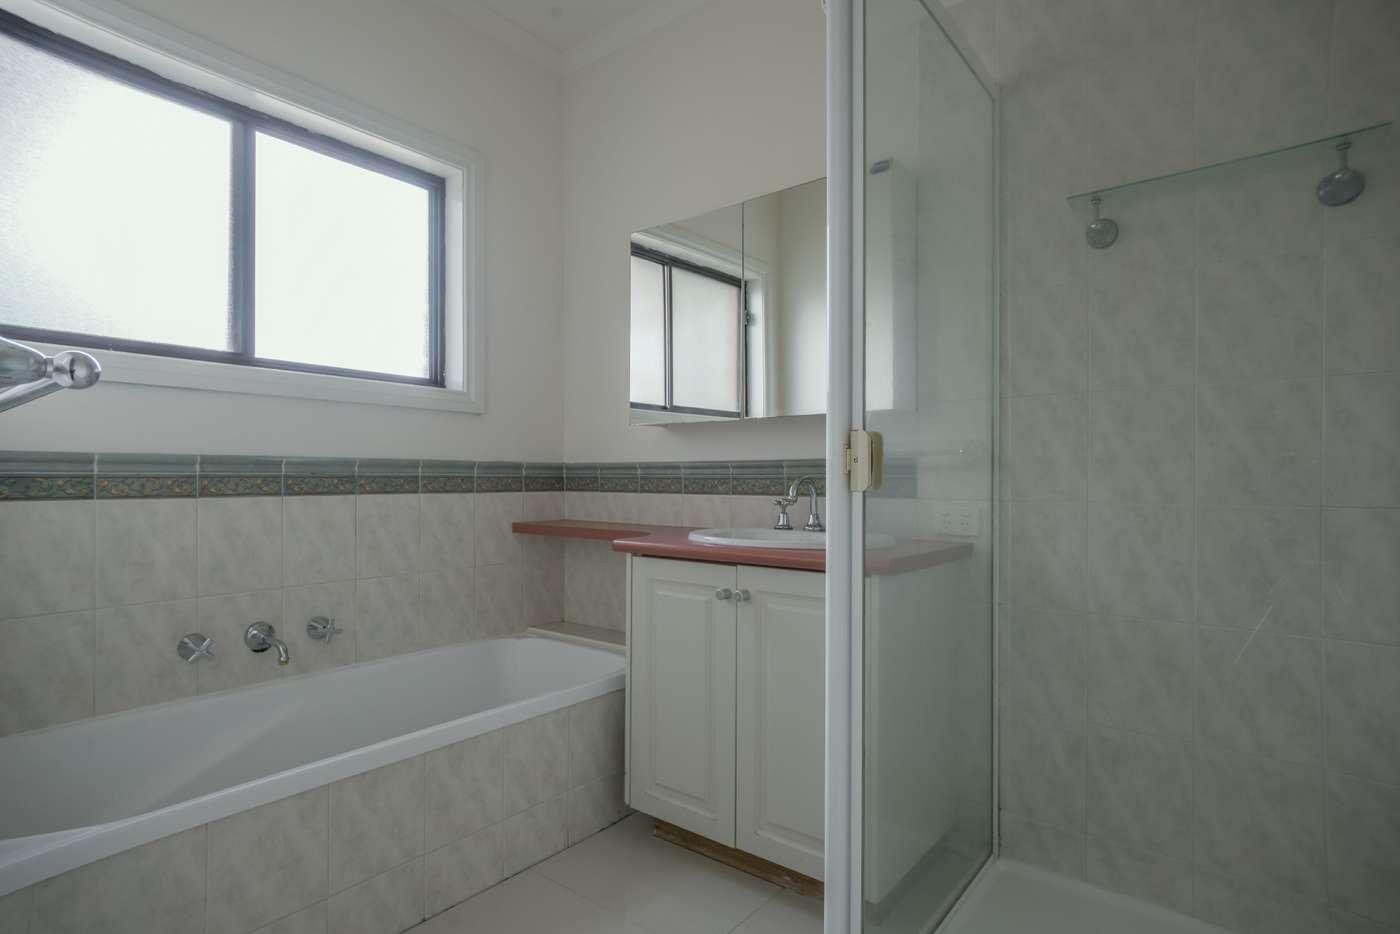 Sixth view of Homely house listing, 1/332a Albert Street, Sebastopol VIC 3356